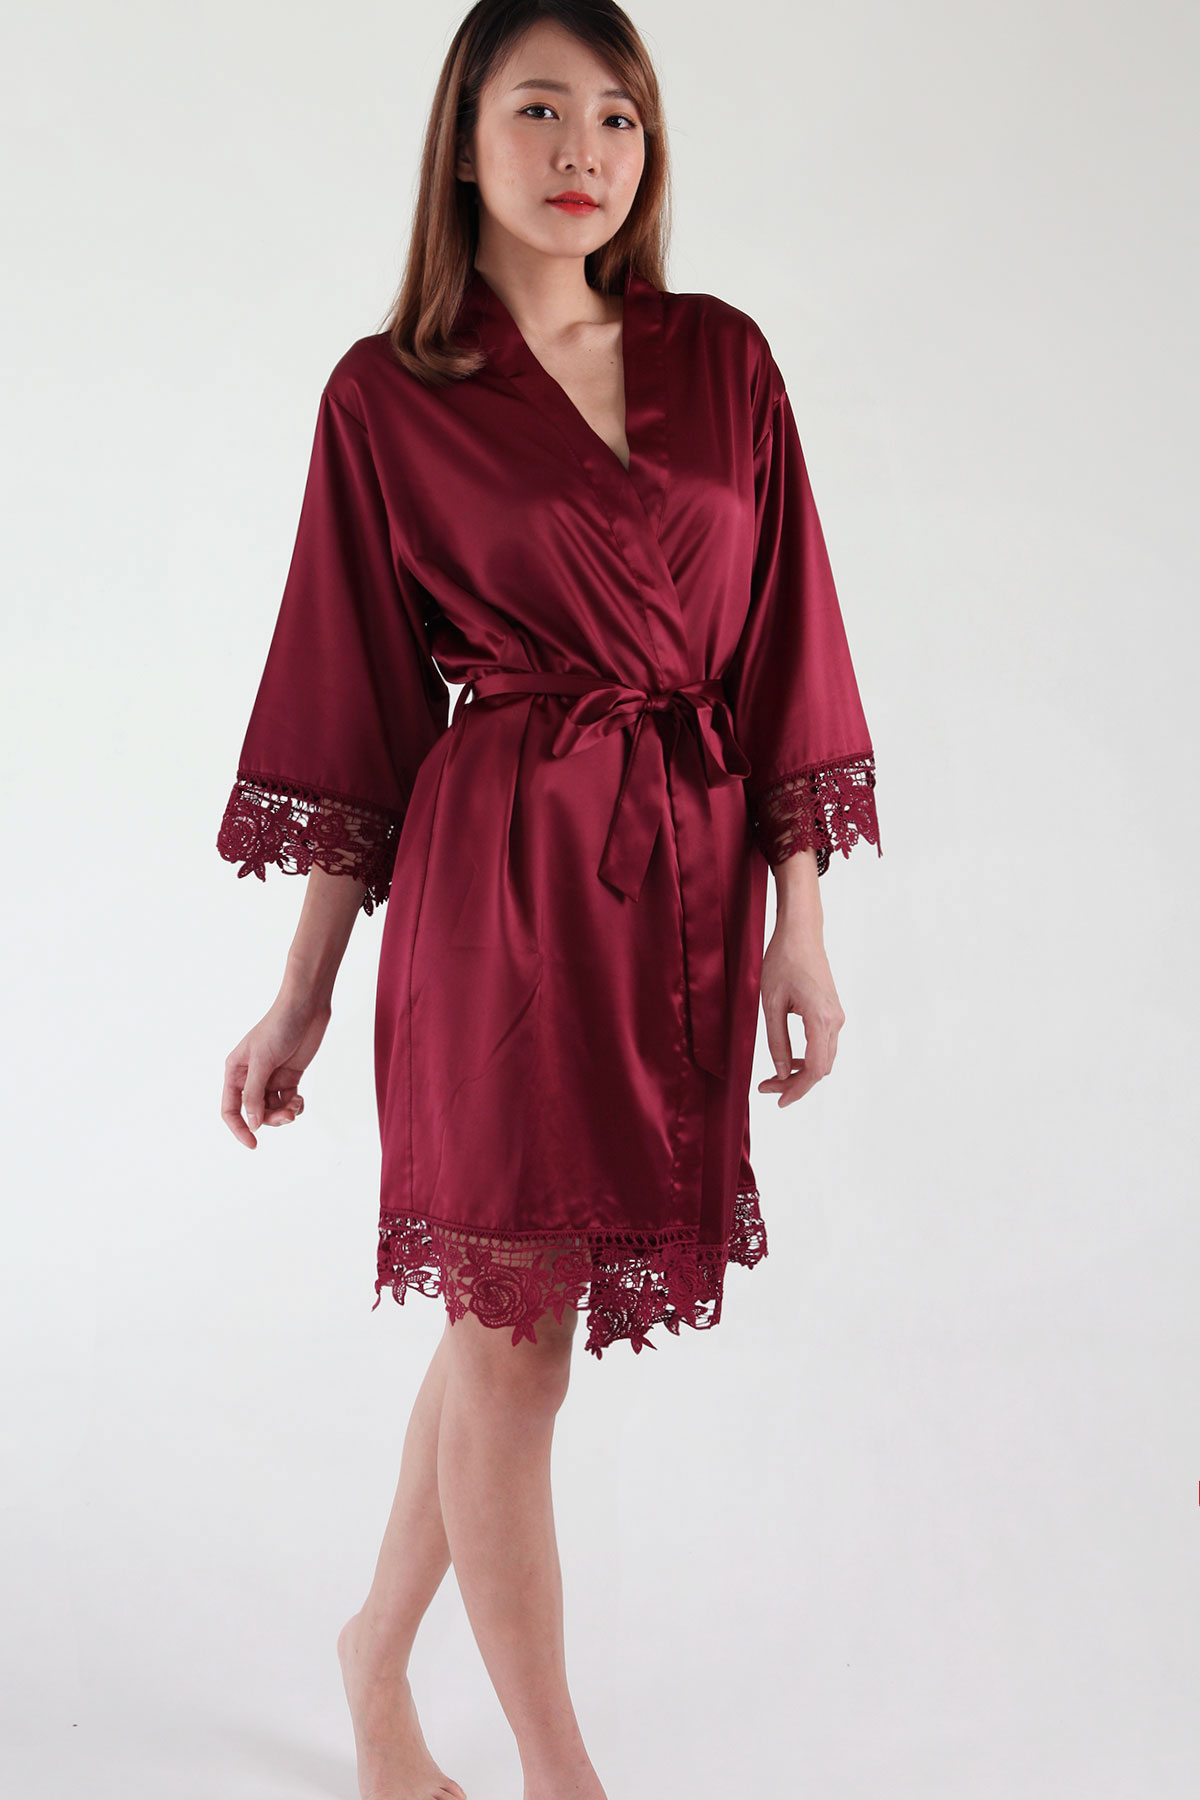 Crochet Trimmed Satin Robe In Burgundy Parsealed